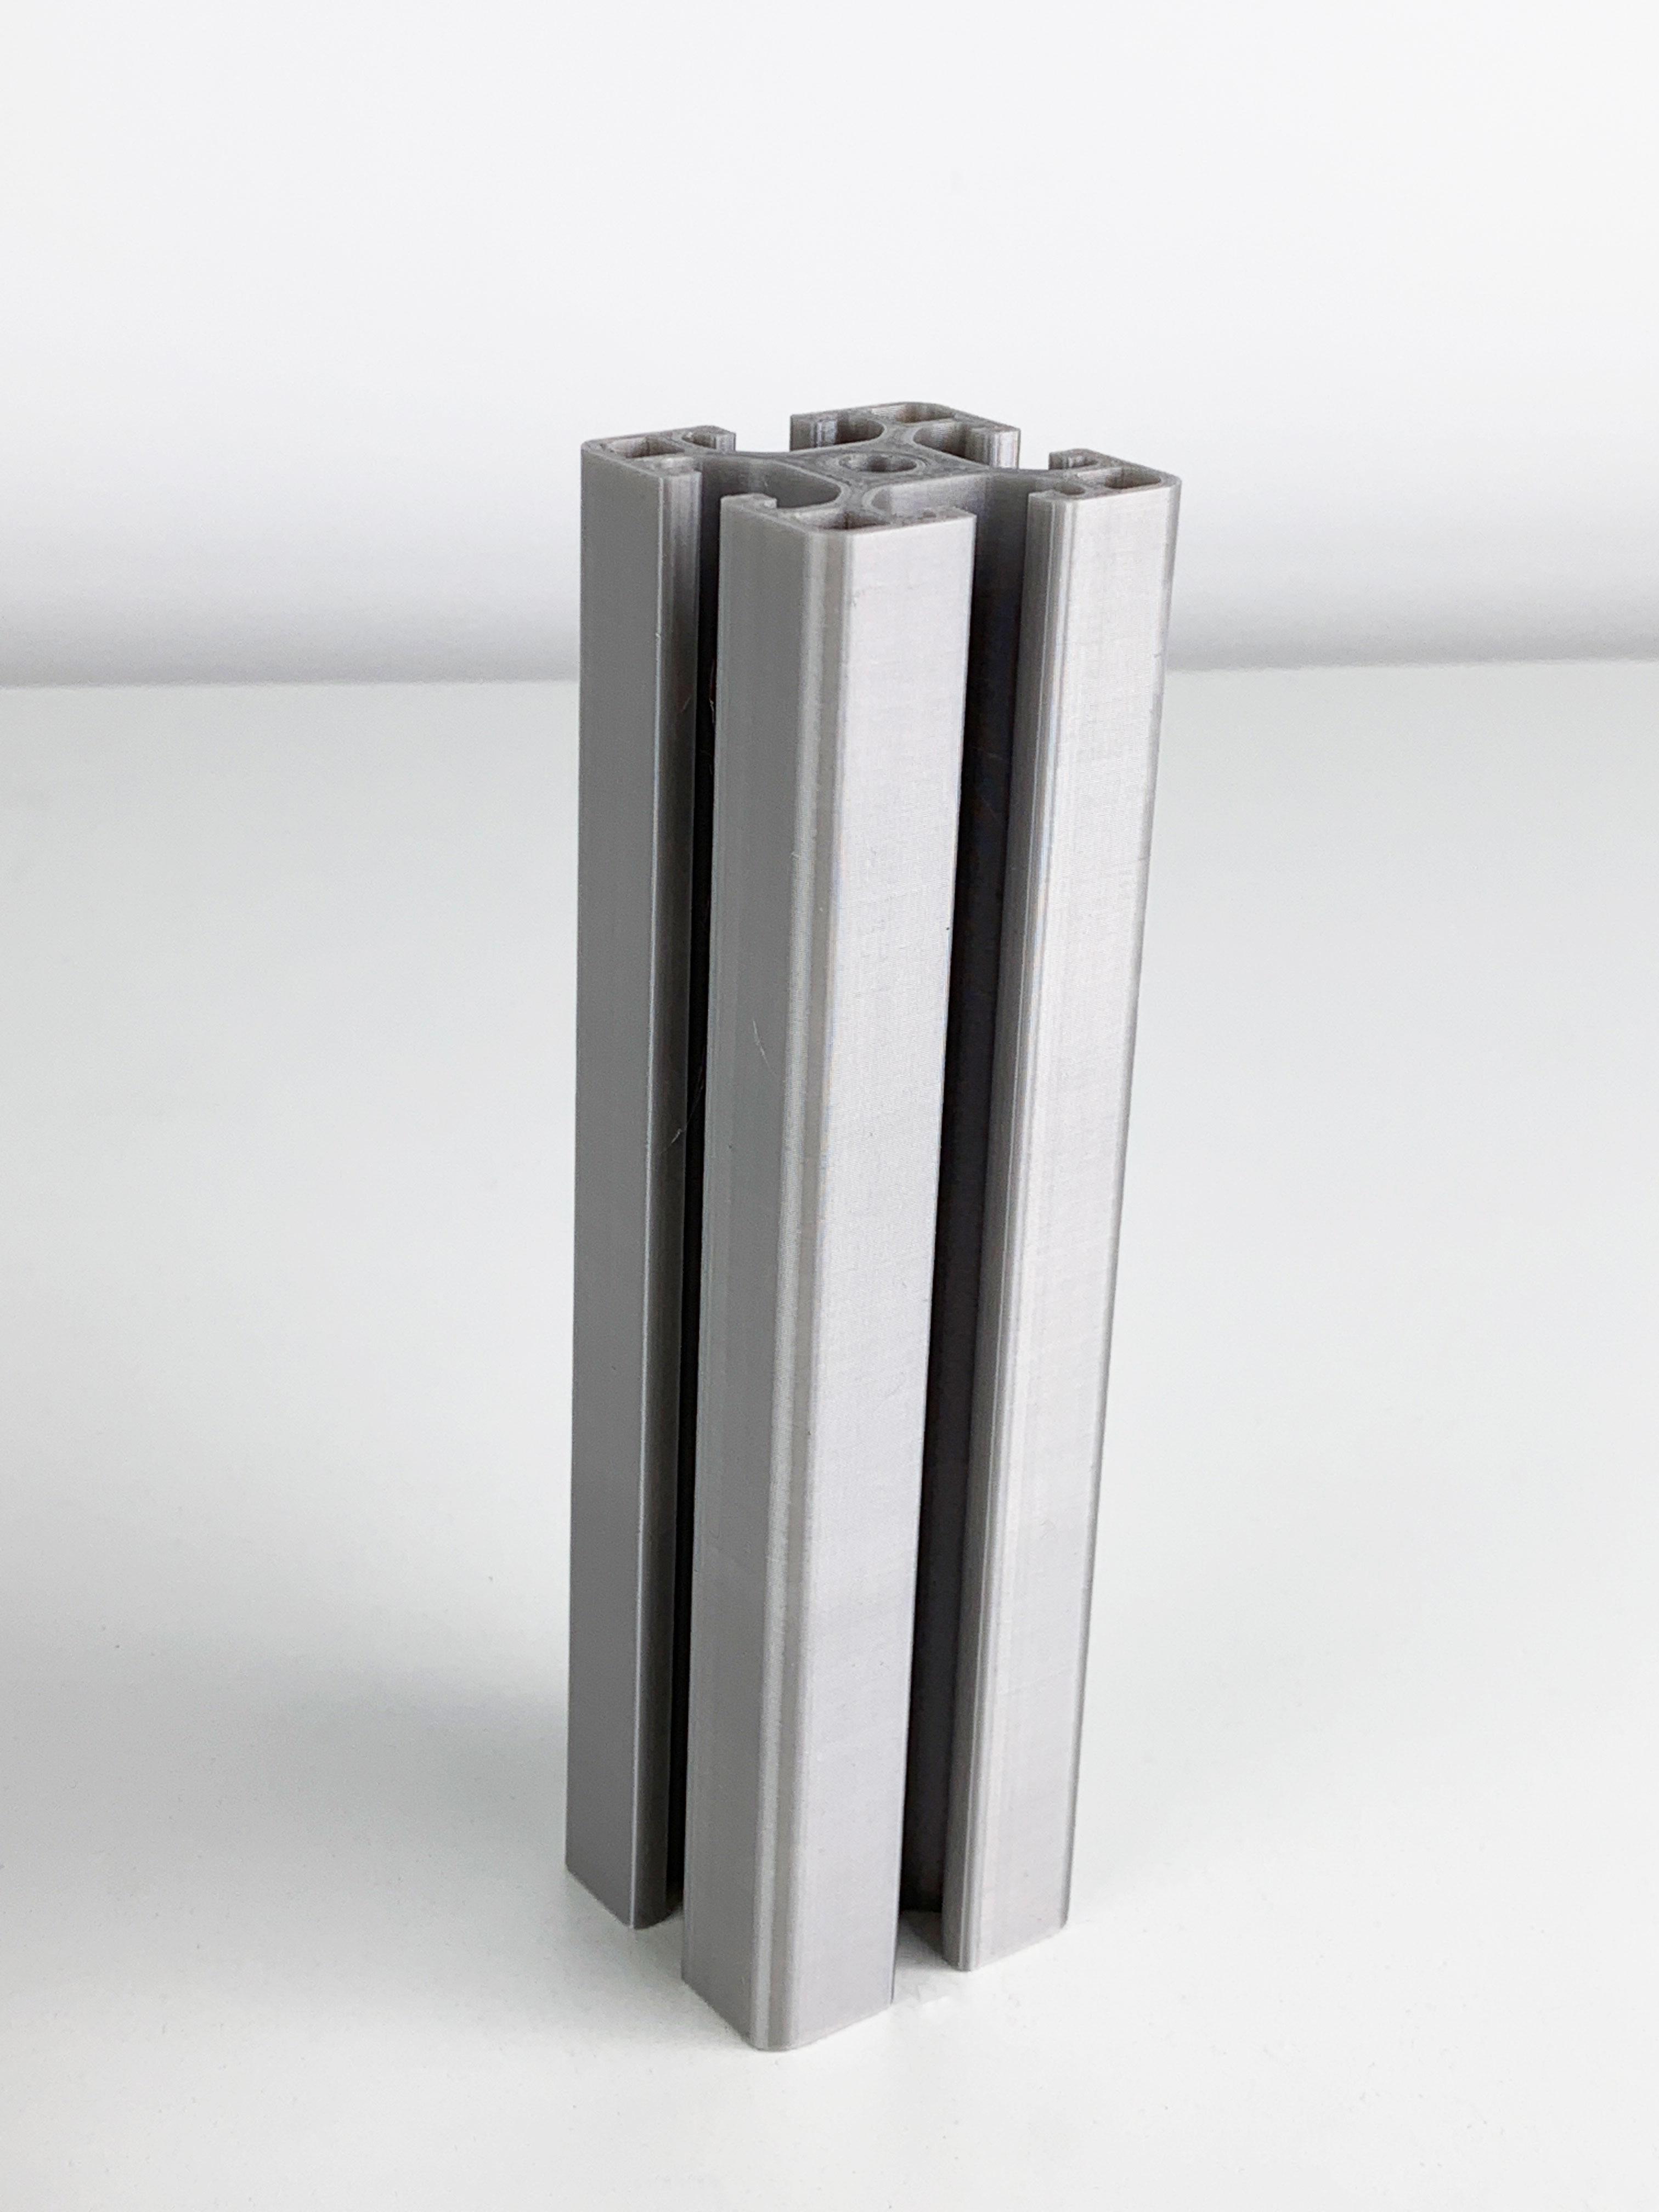 Neue PETG Farbe: Alu-Silber!